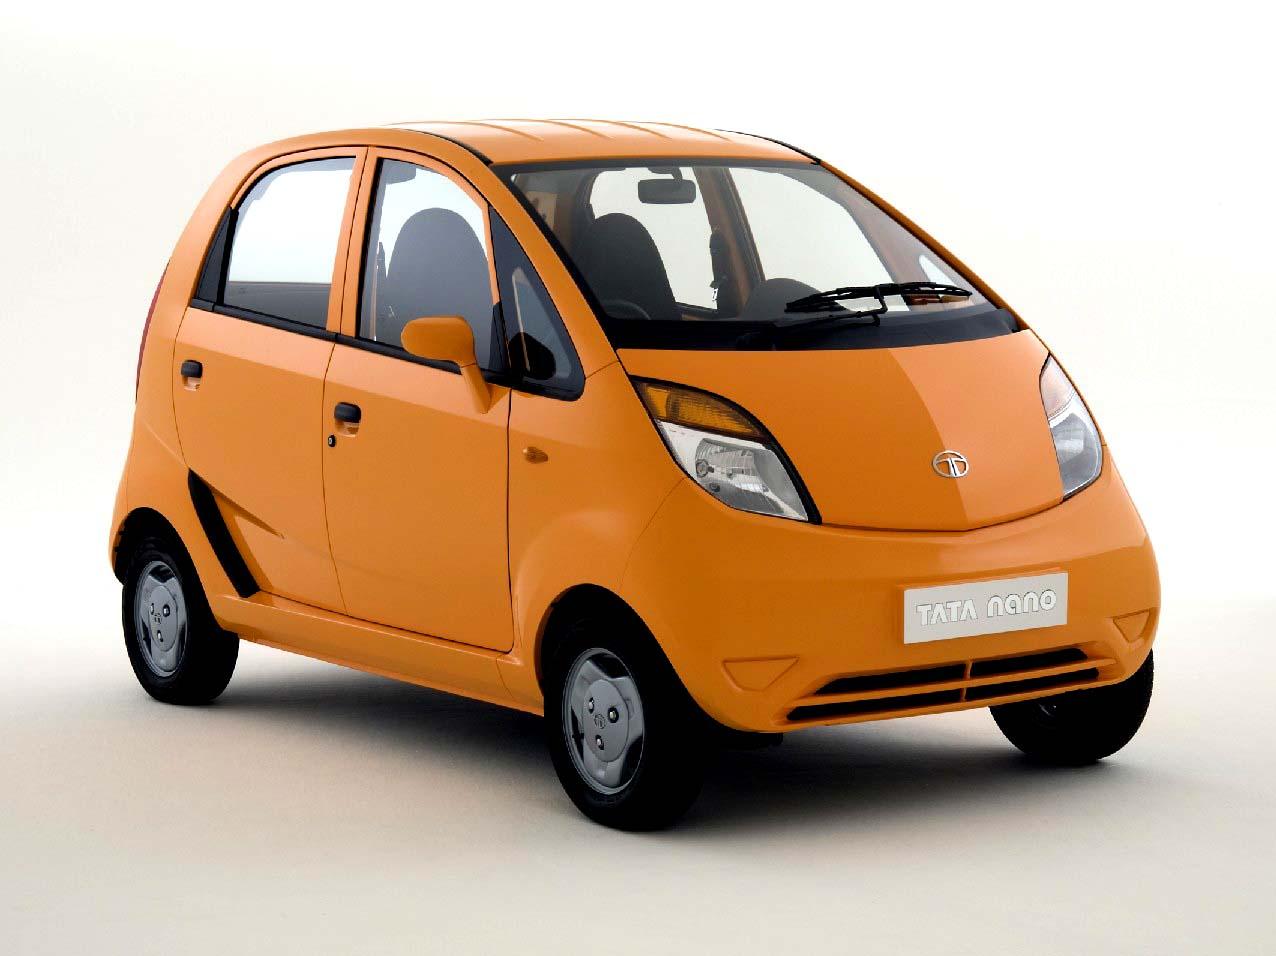 Best Looking Fuel Efficient Cars